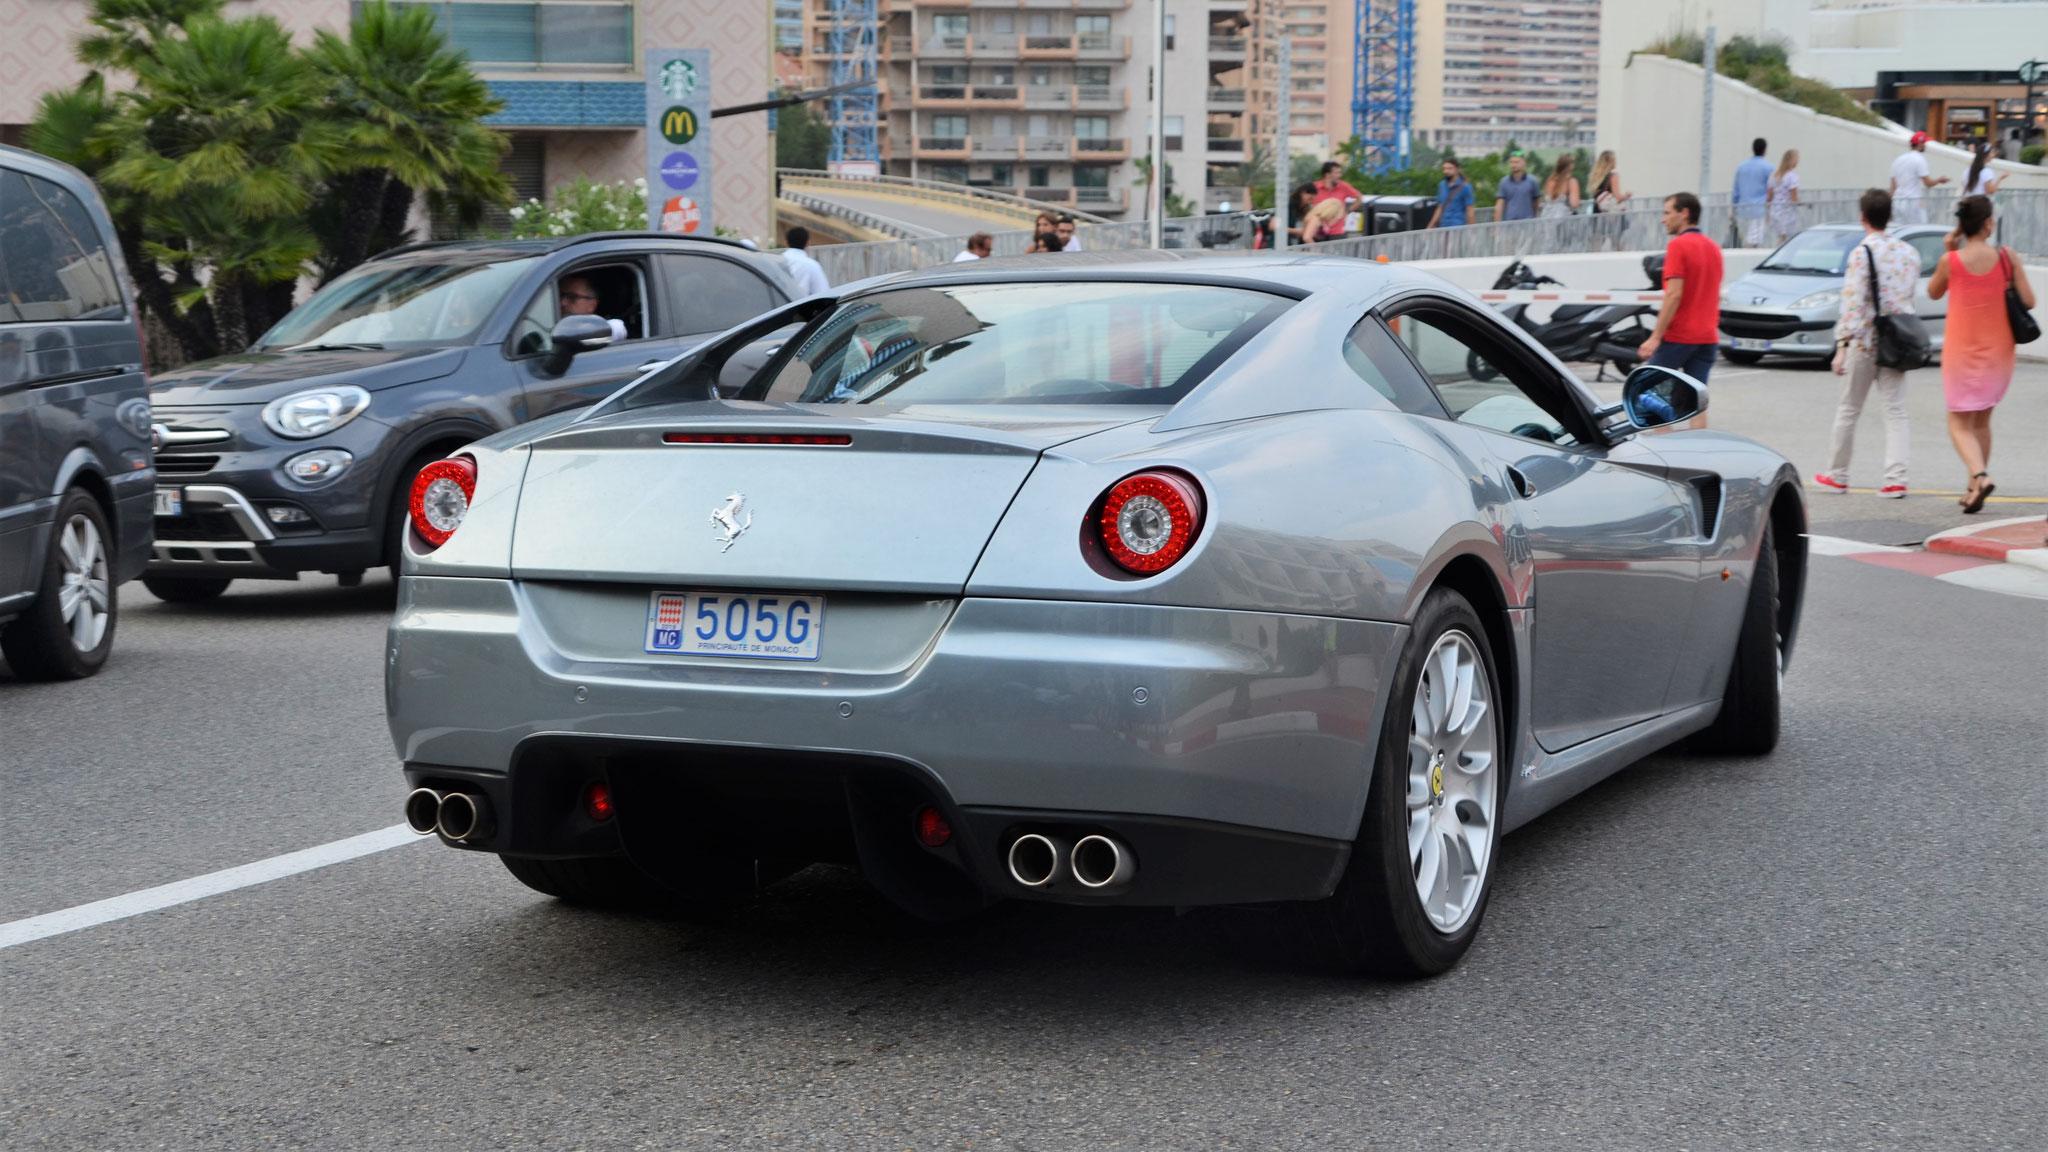 Ferrari 599 GTB - 505G (MC)